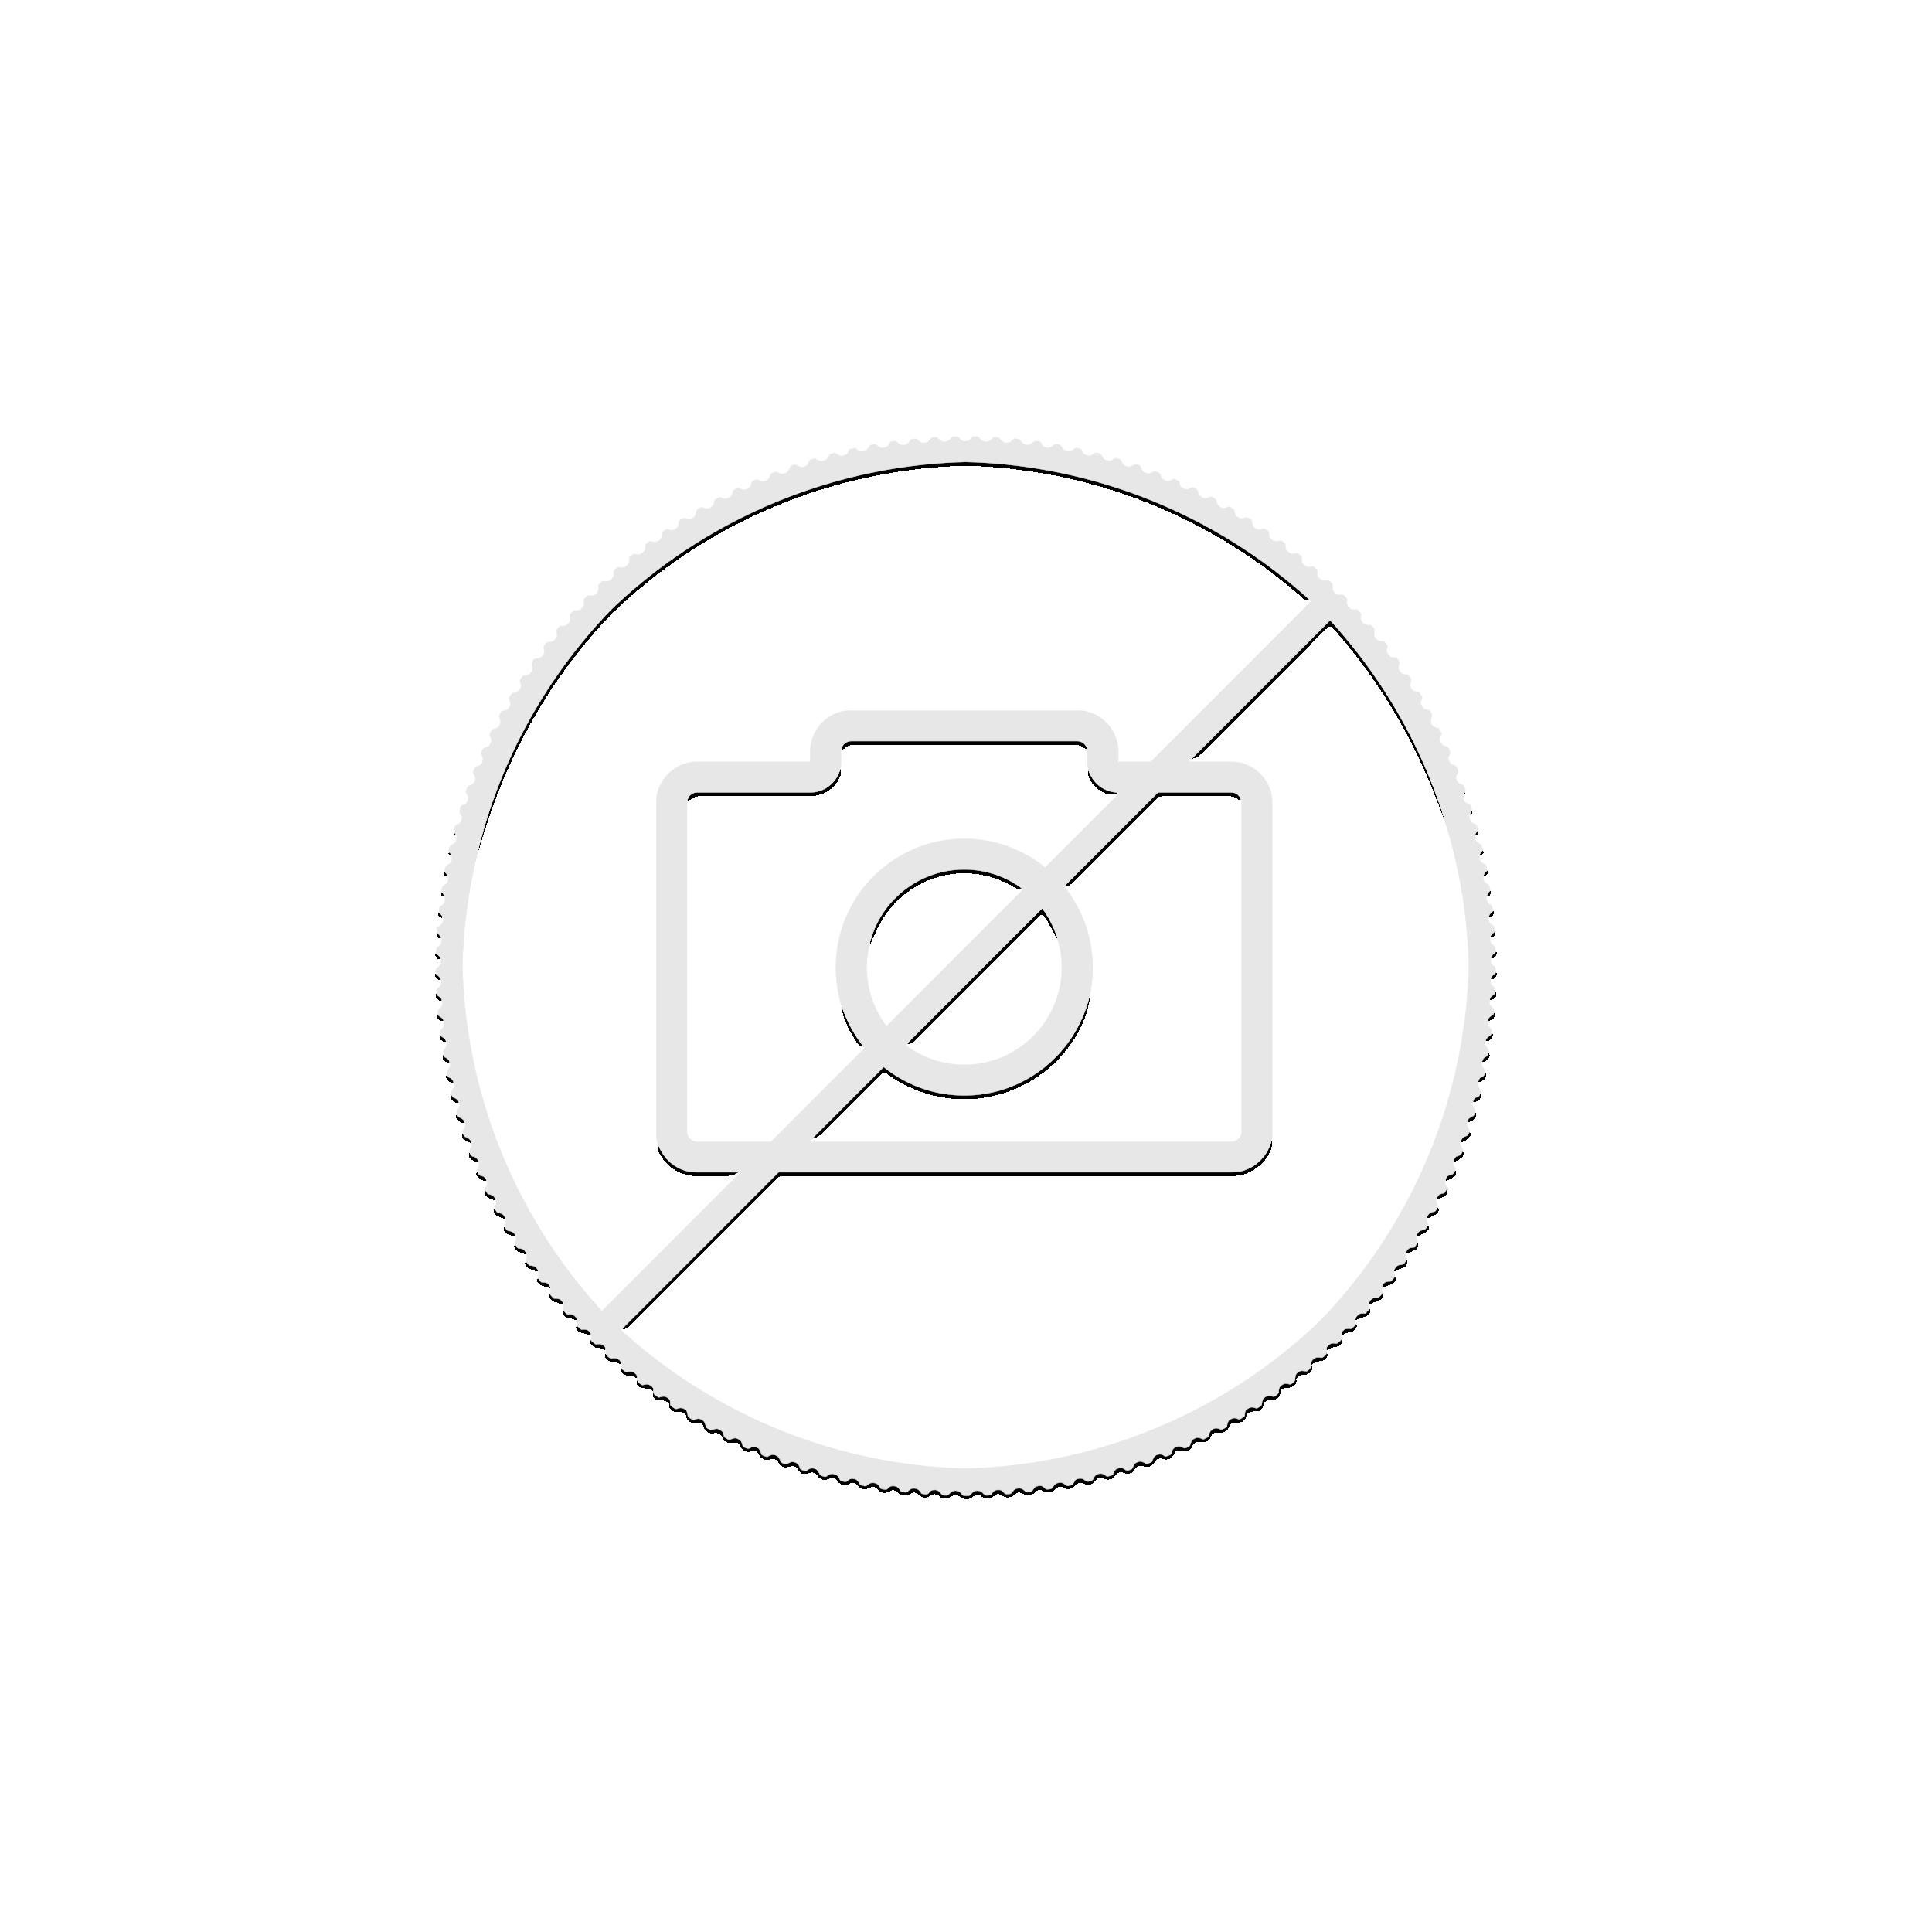 1 troy ounce zilveren munt Afrikaanse Leeuw 2021